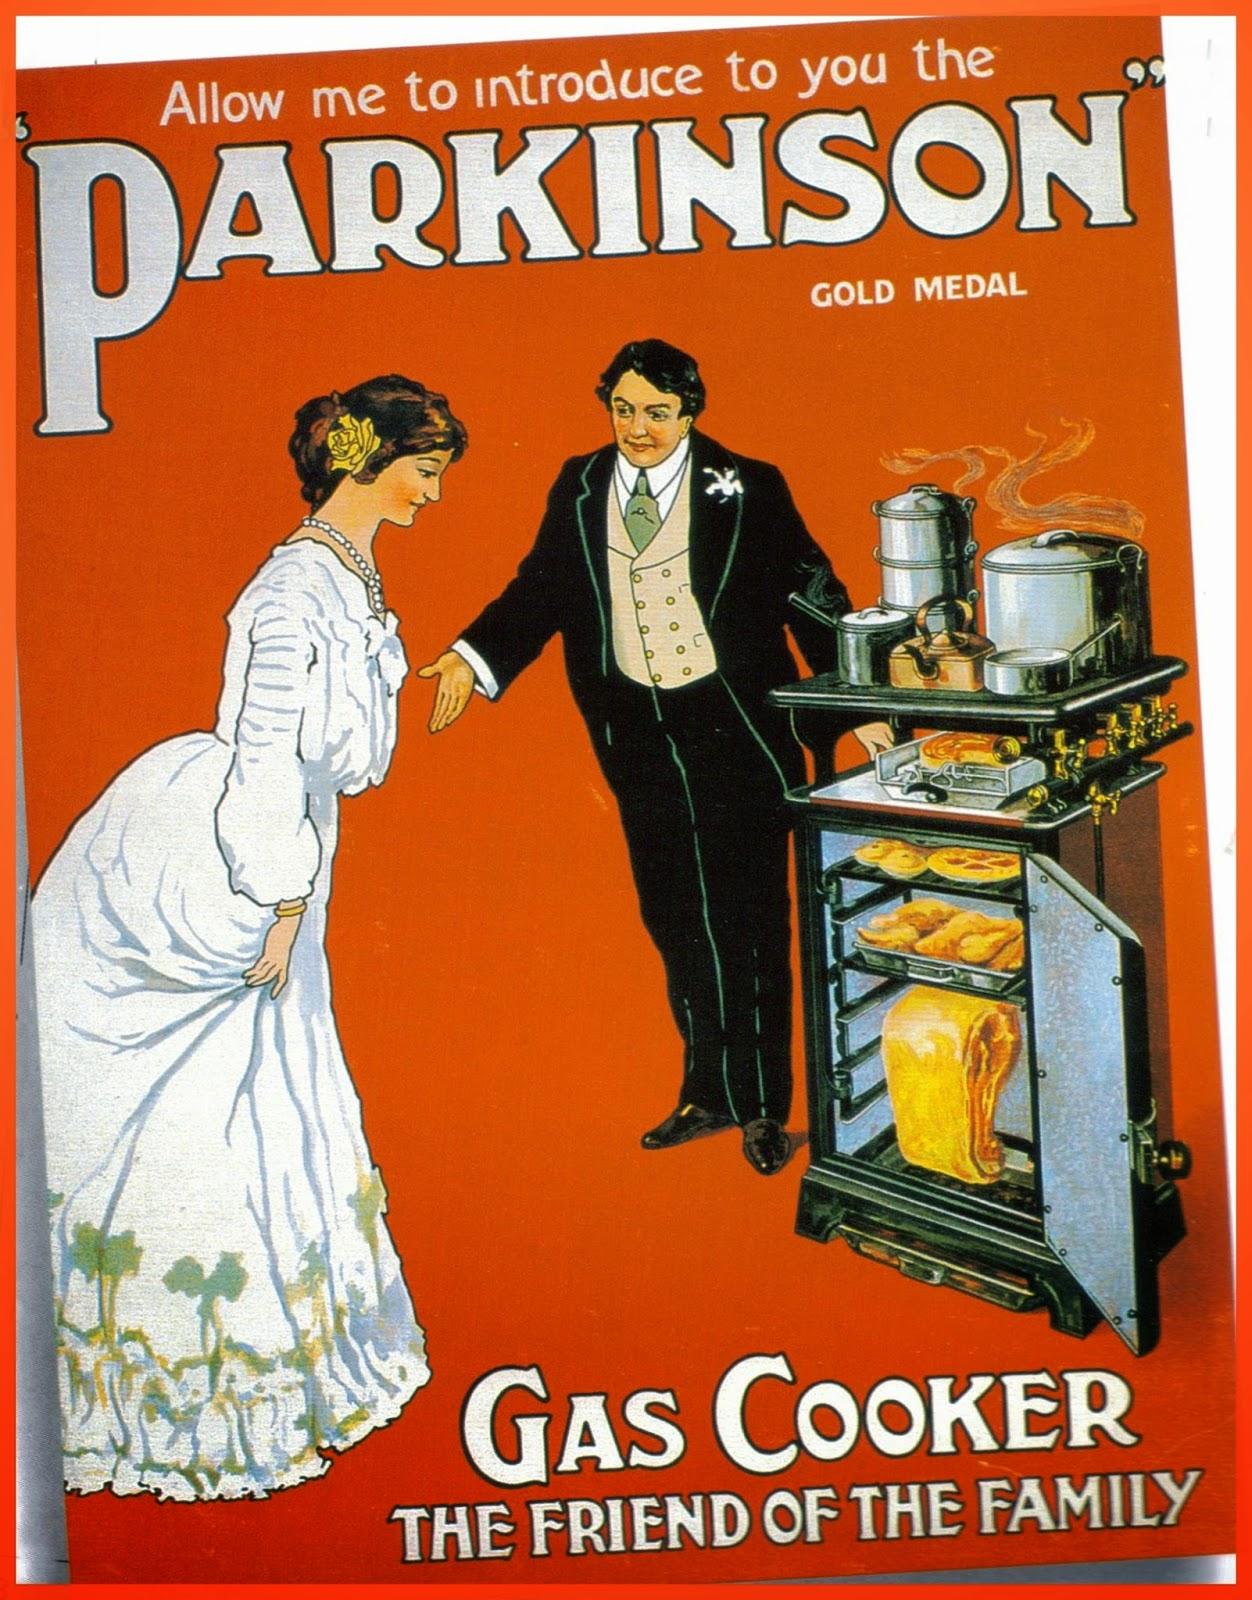 1910 Parkinson Gas Cooker